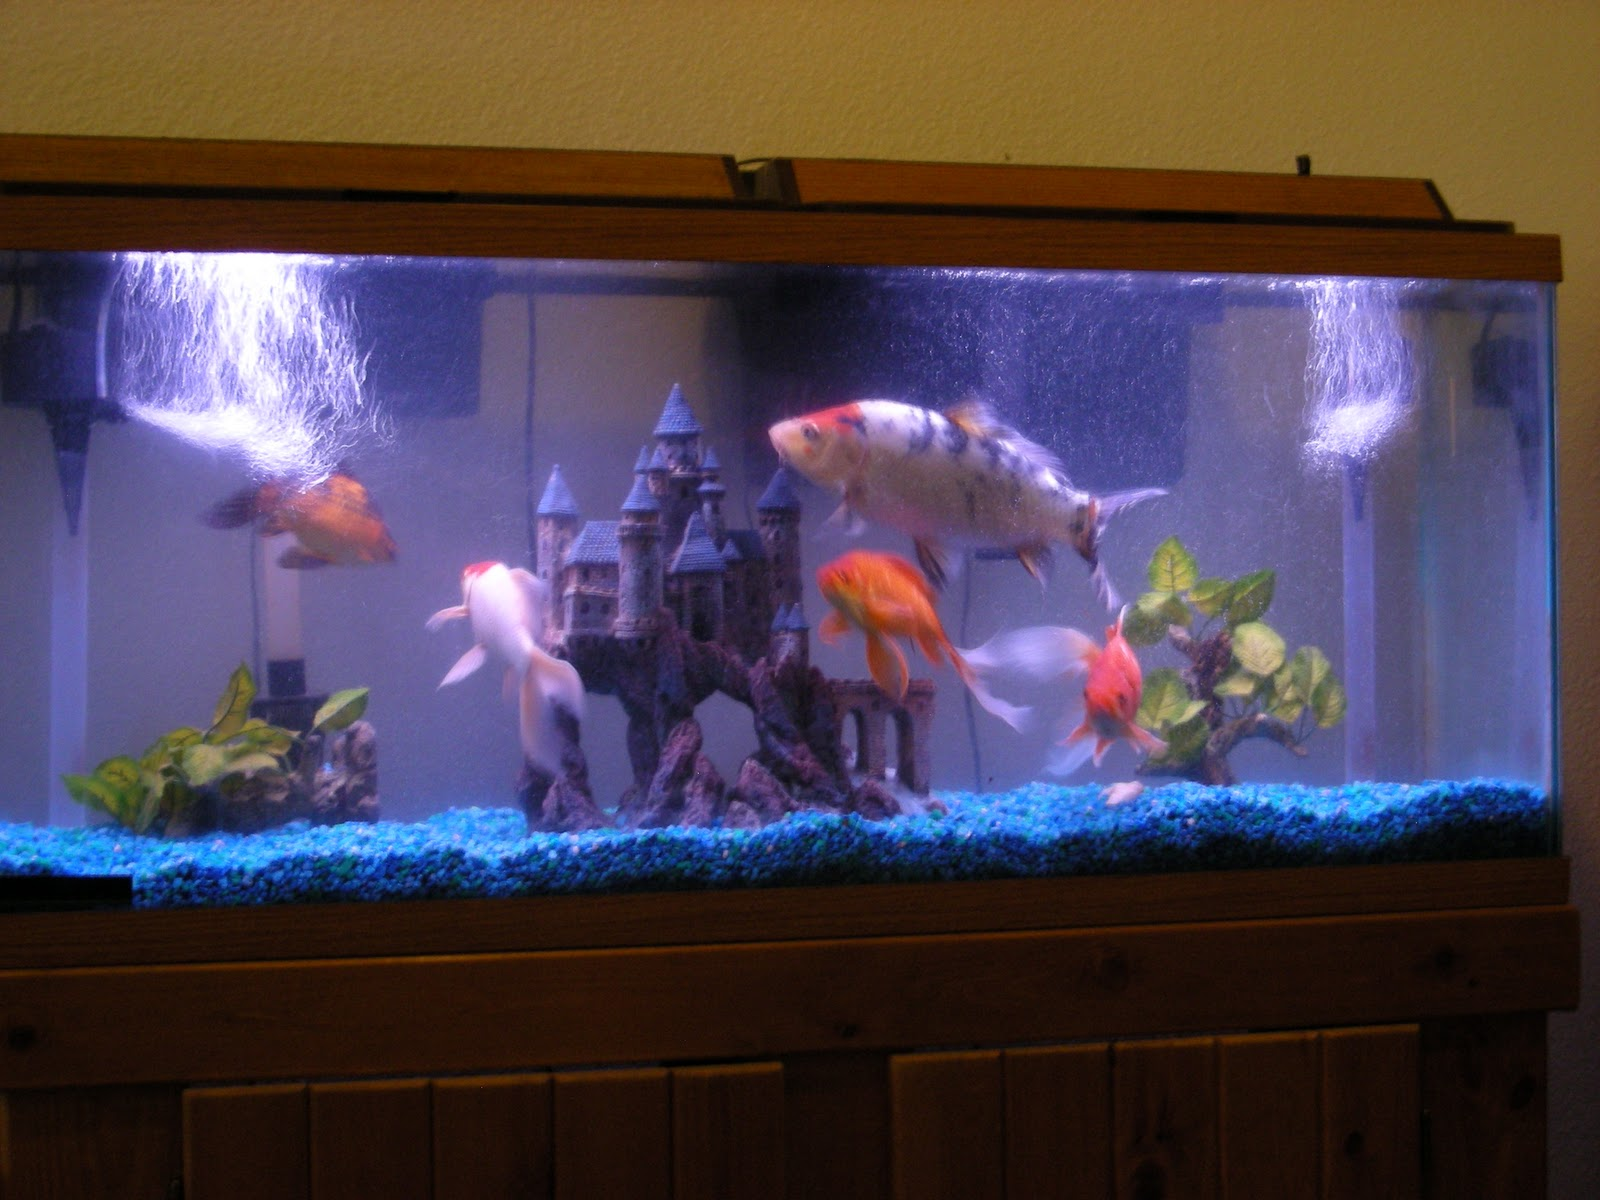 55 gallon fish tank in litres fish tank pauls 55 gallon 200 litre fresh water tropical. Black Bedroom Furniture Sets. Home Design Ideas